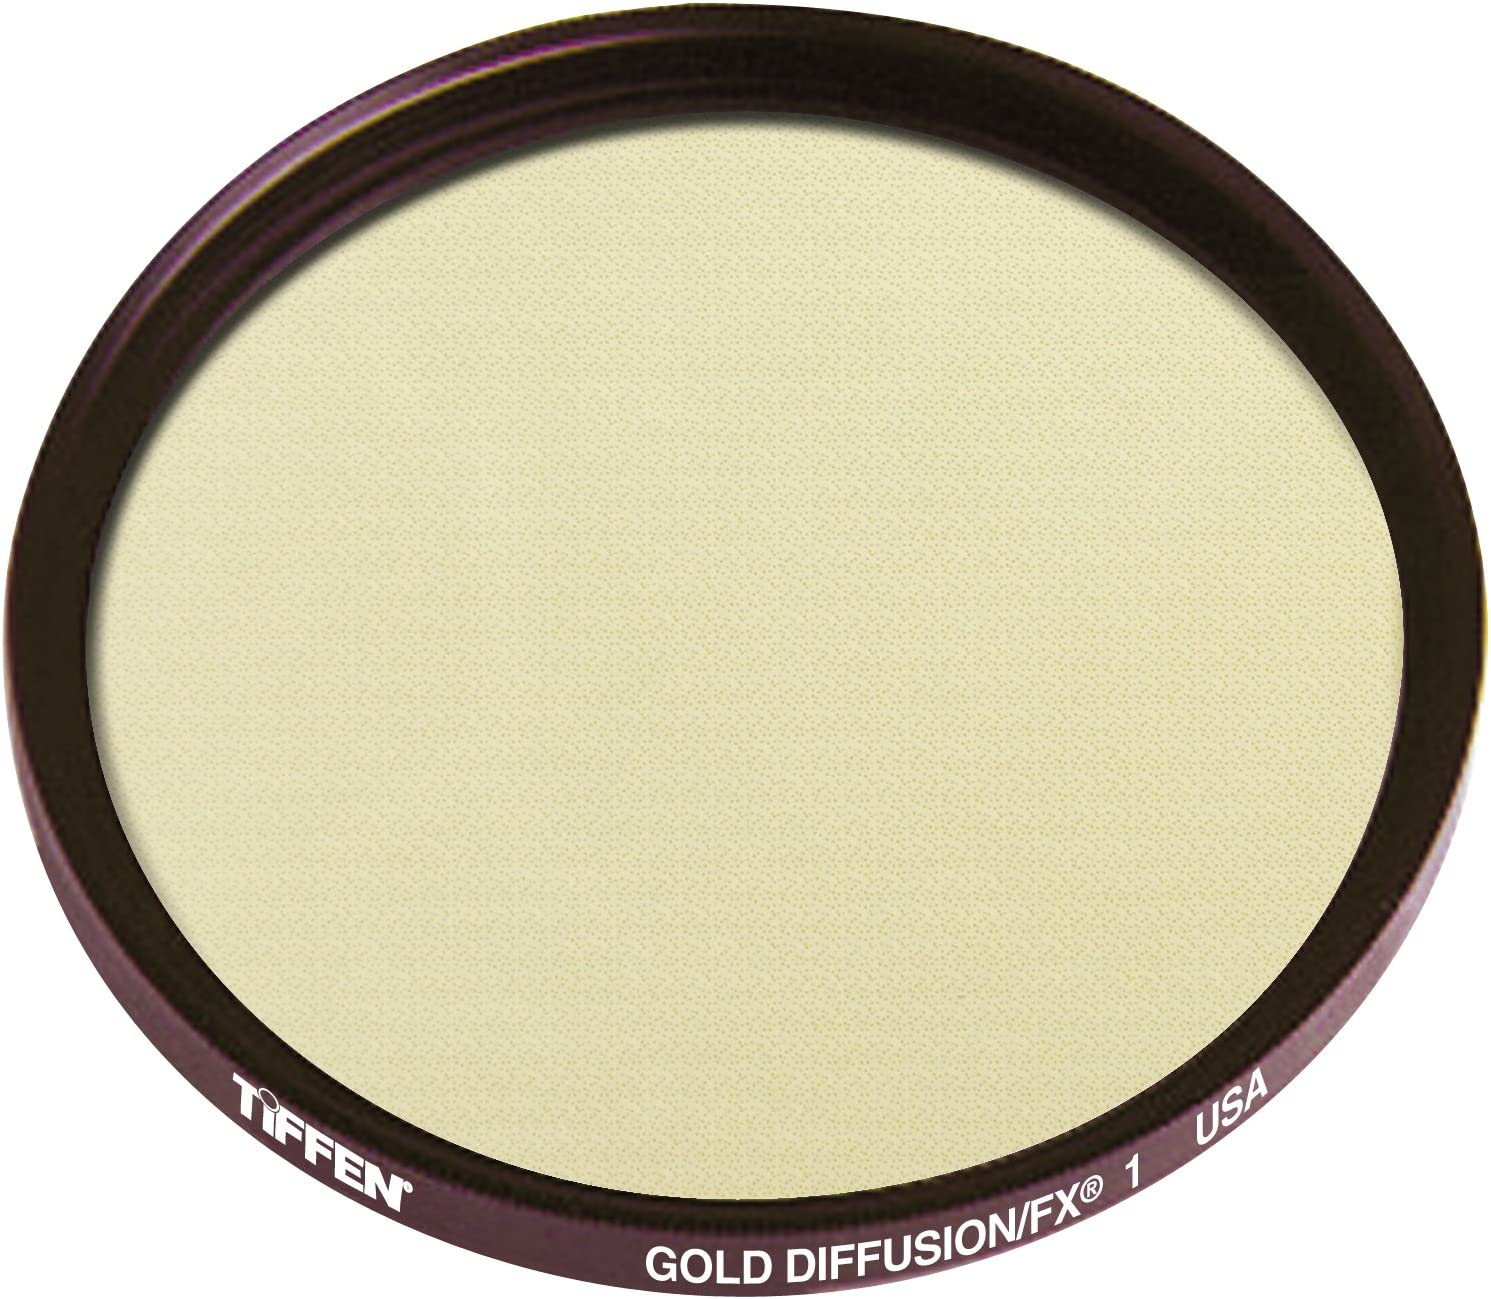 Tiffen Series 9 Gold Diffusion FX 1 Filter